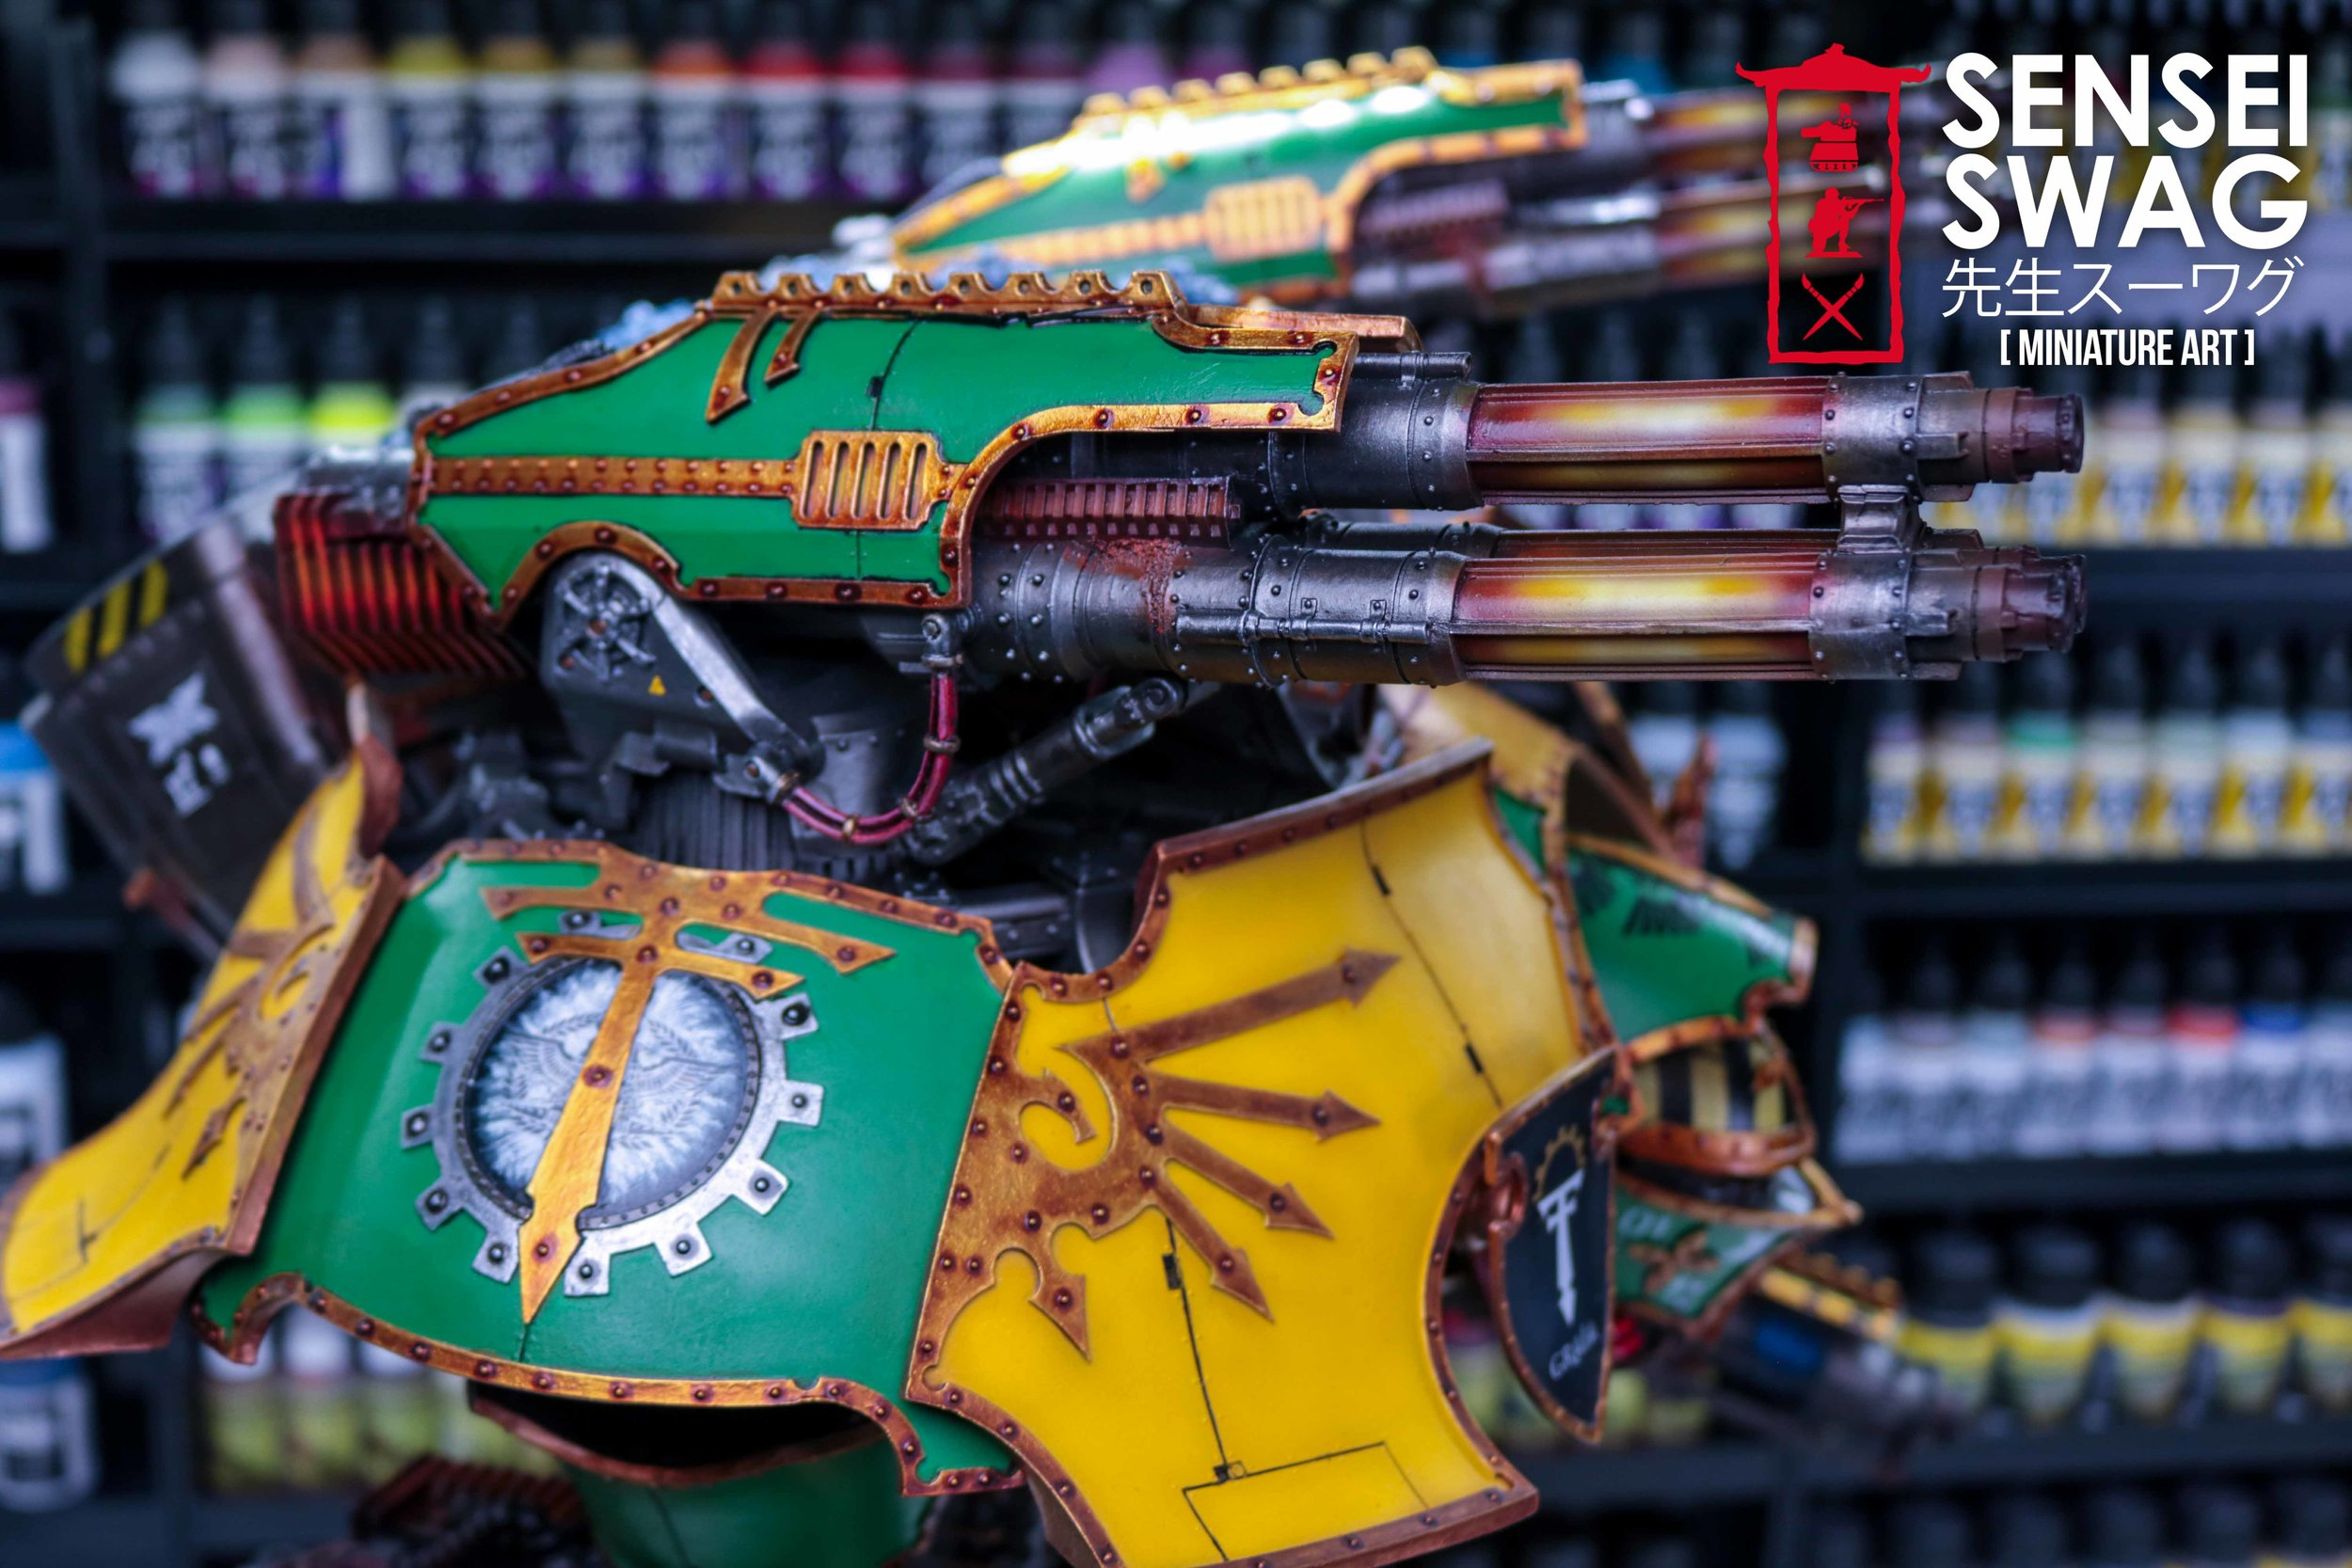 Legio Astraman Warlord Titan Forgeworld Warhammer 40k 30k-6.jpg